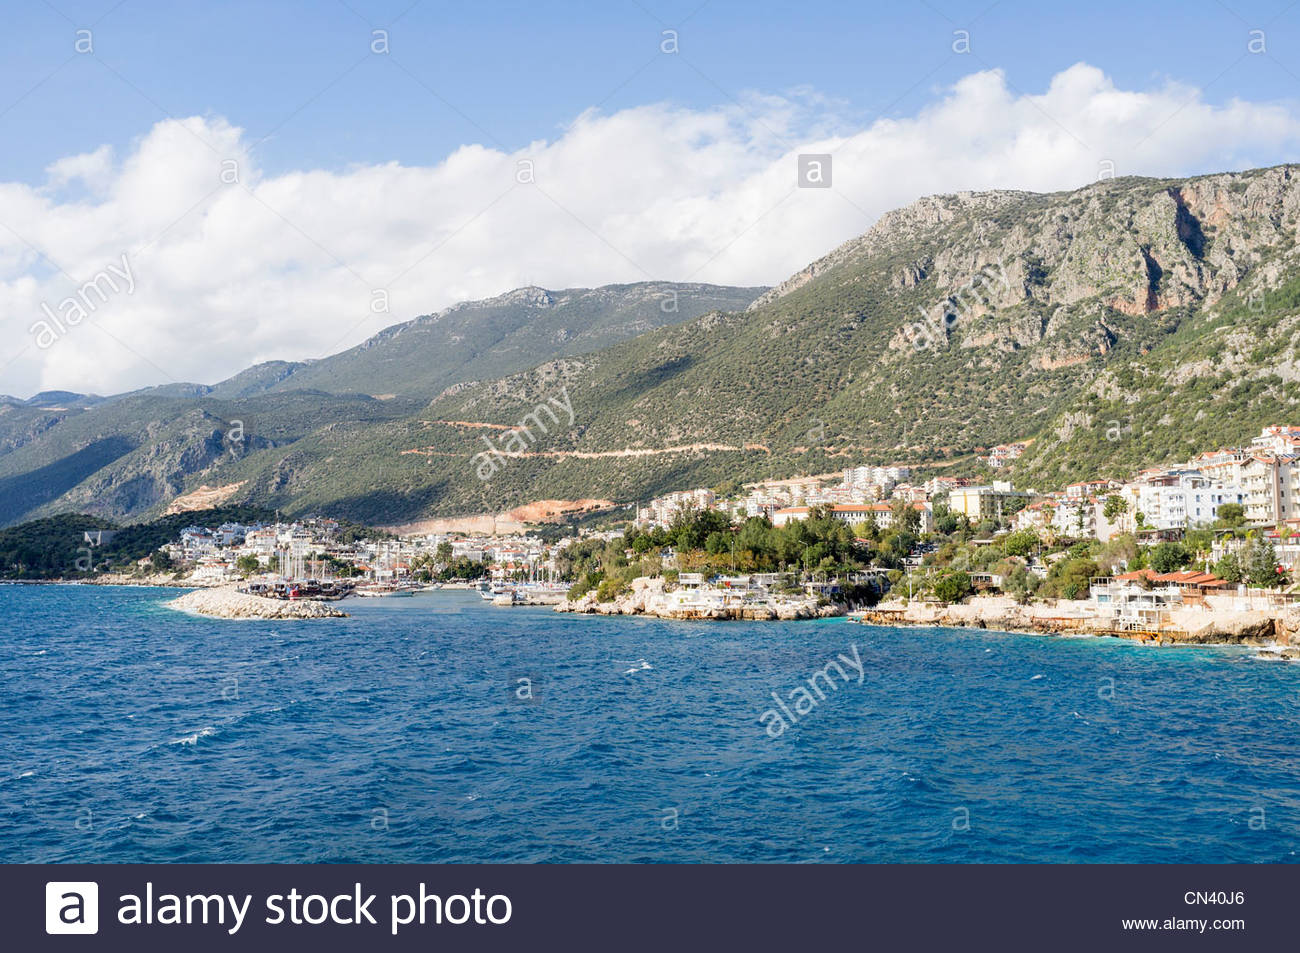 Town of Kaş, Antalya Province, Turkey - Stock Image